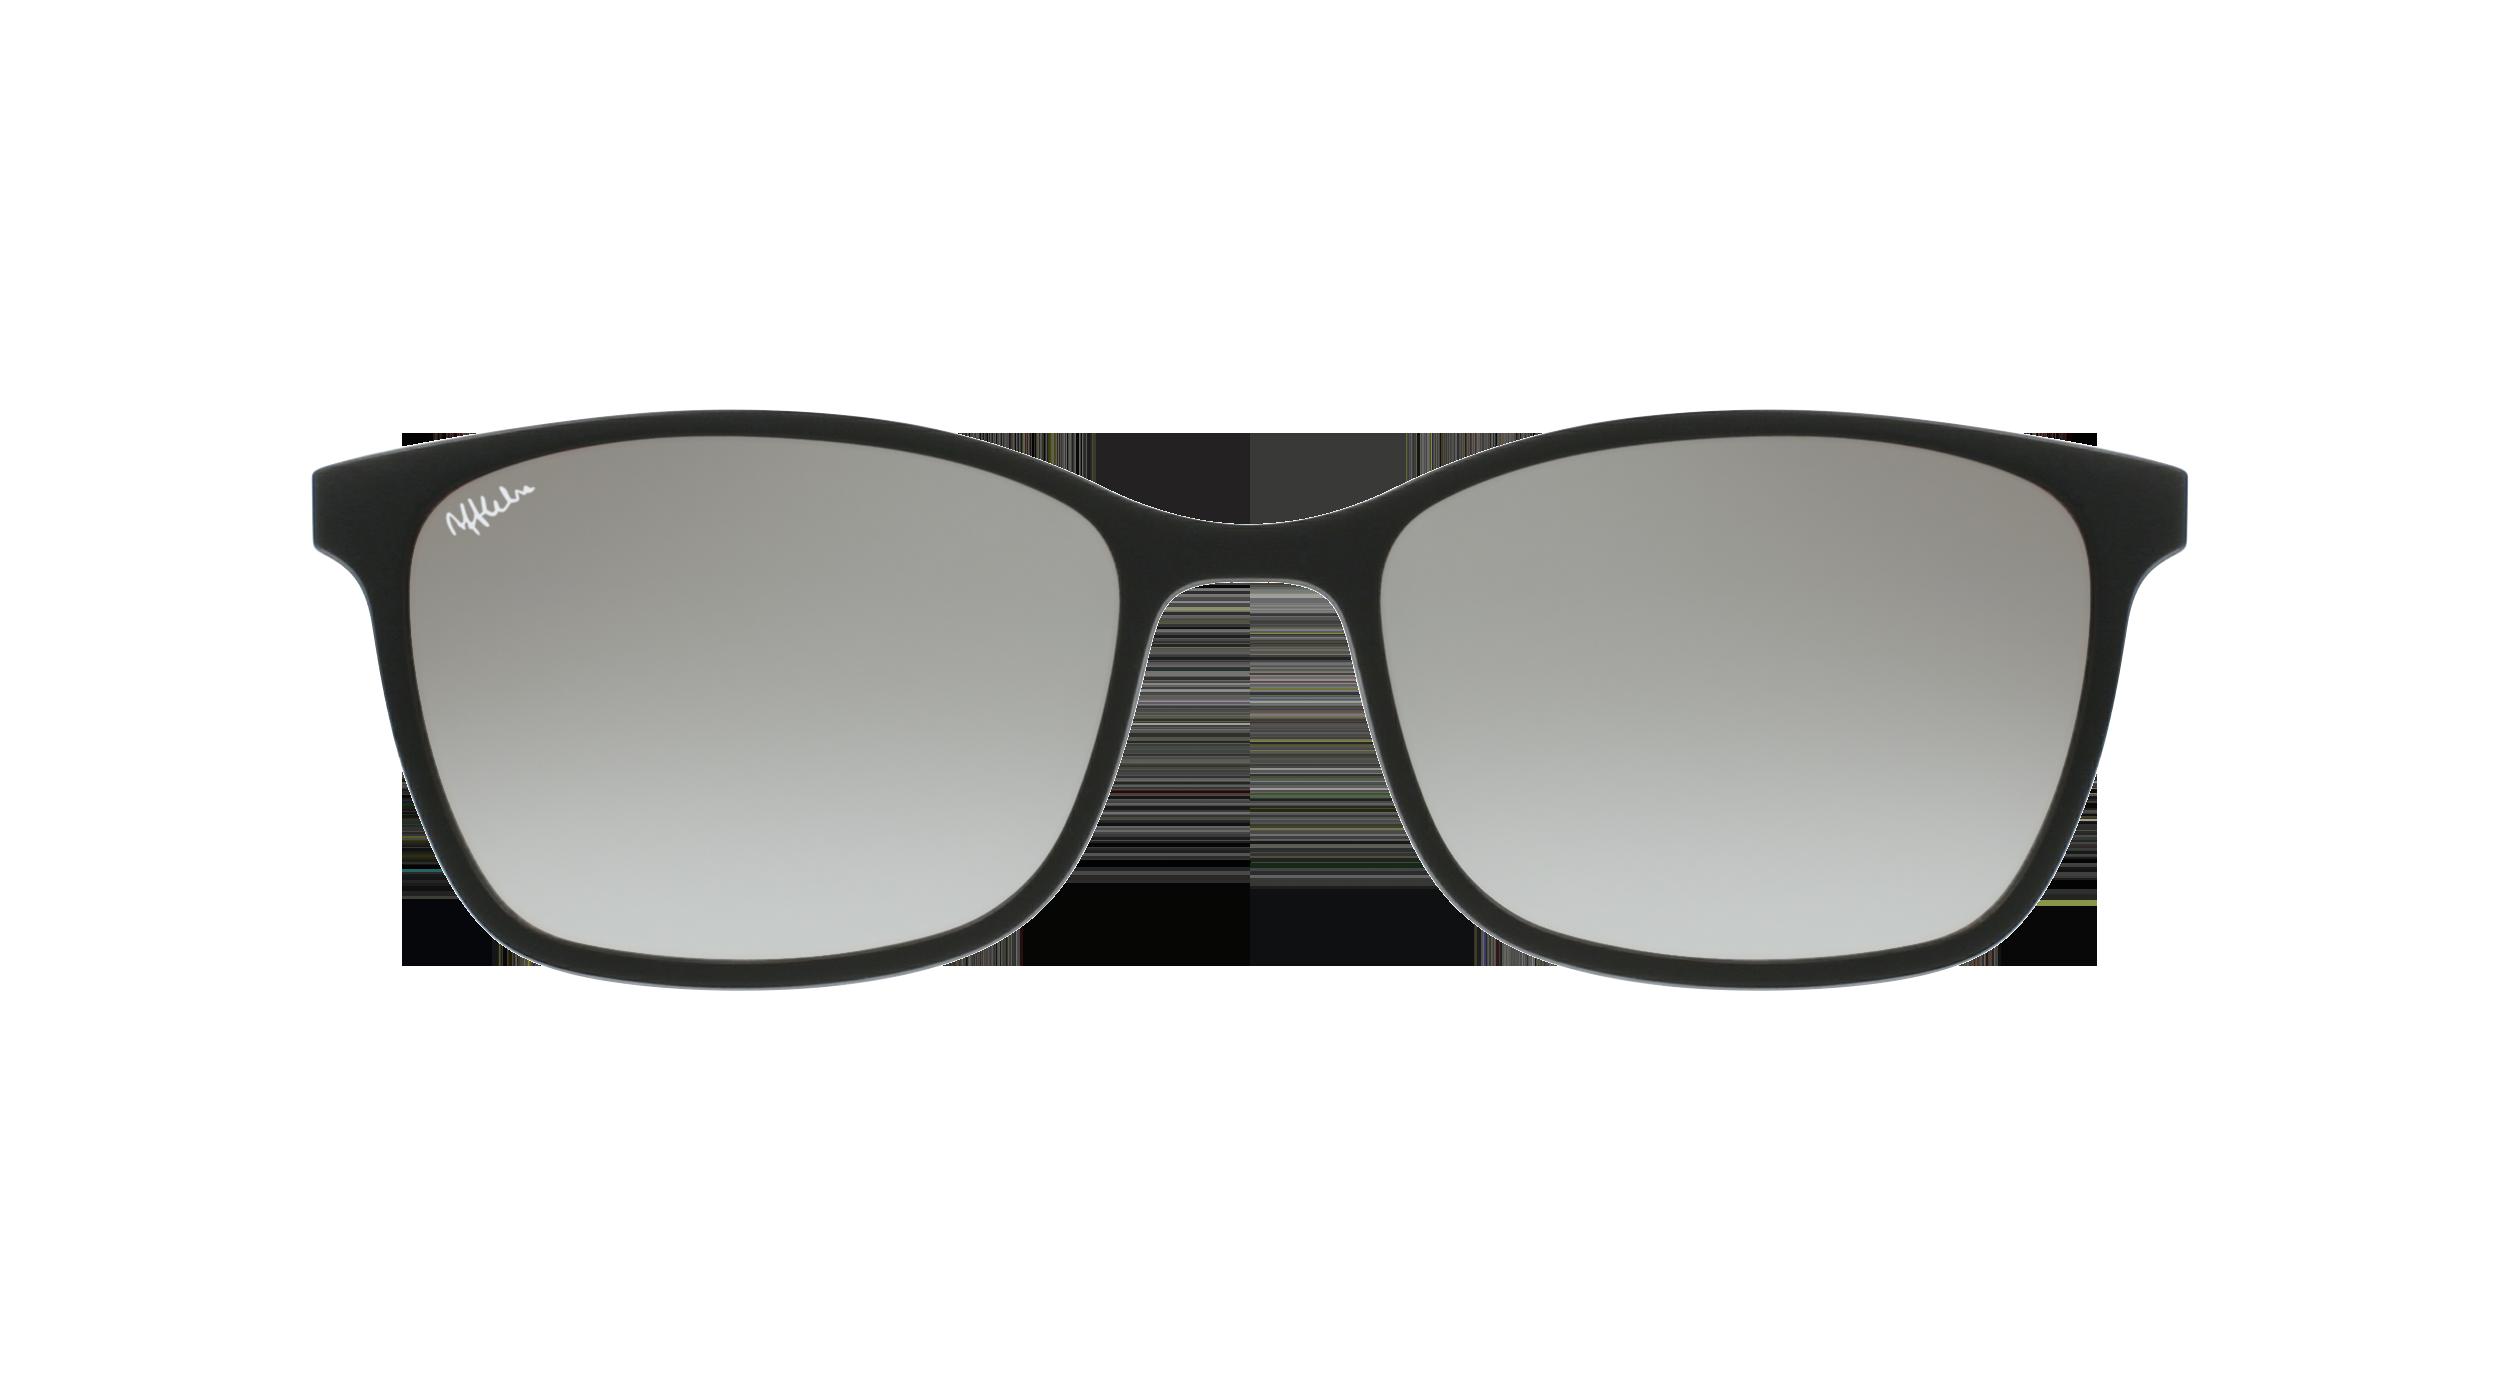 afflelou/france/products/smart_clip/clips_glasses/07630036459058.png